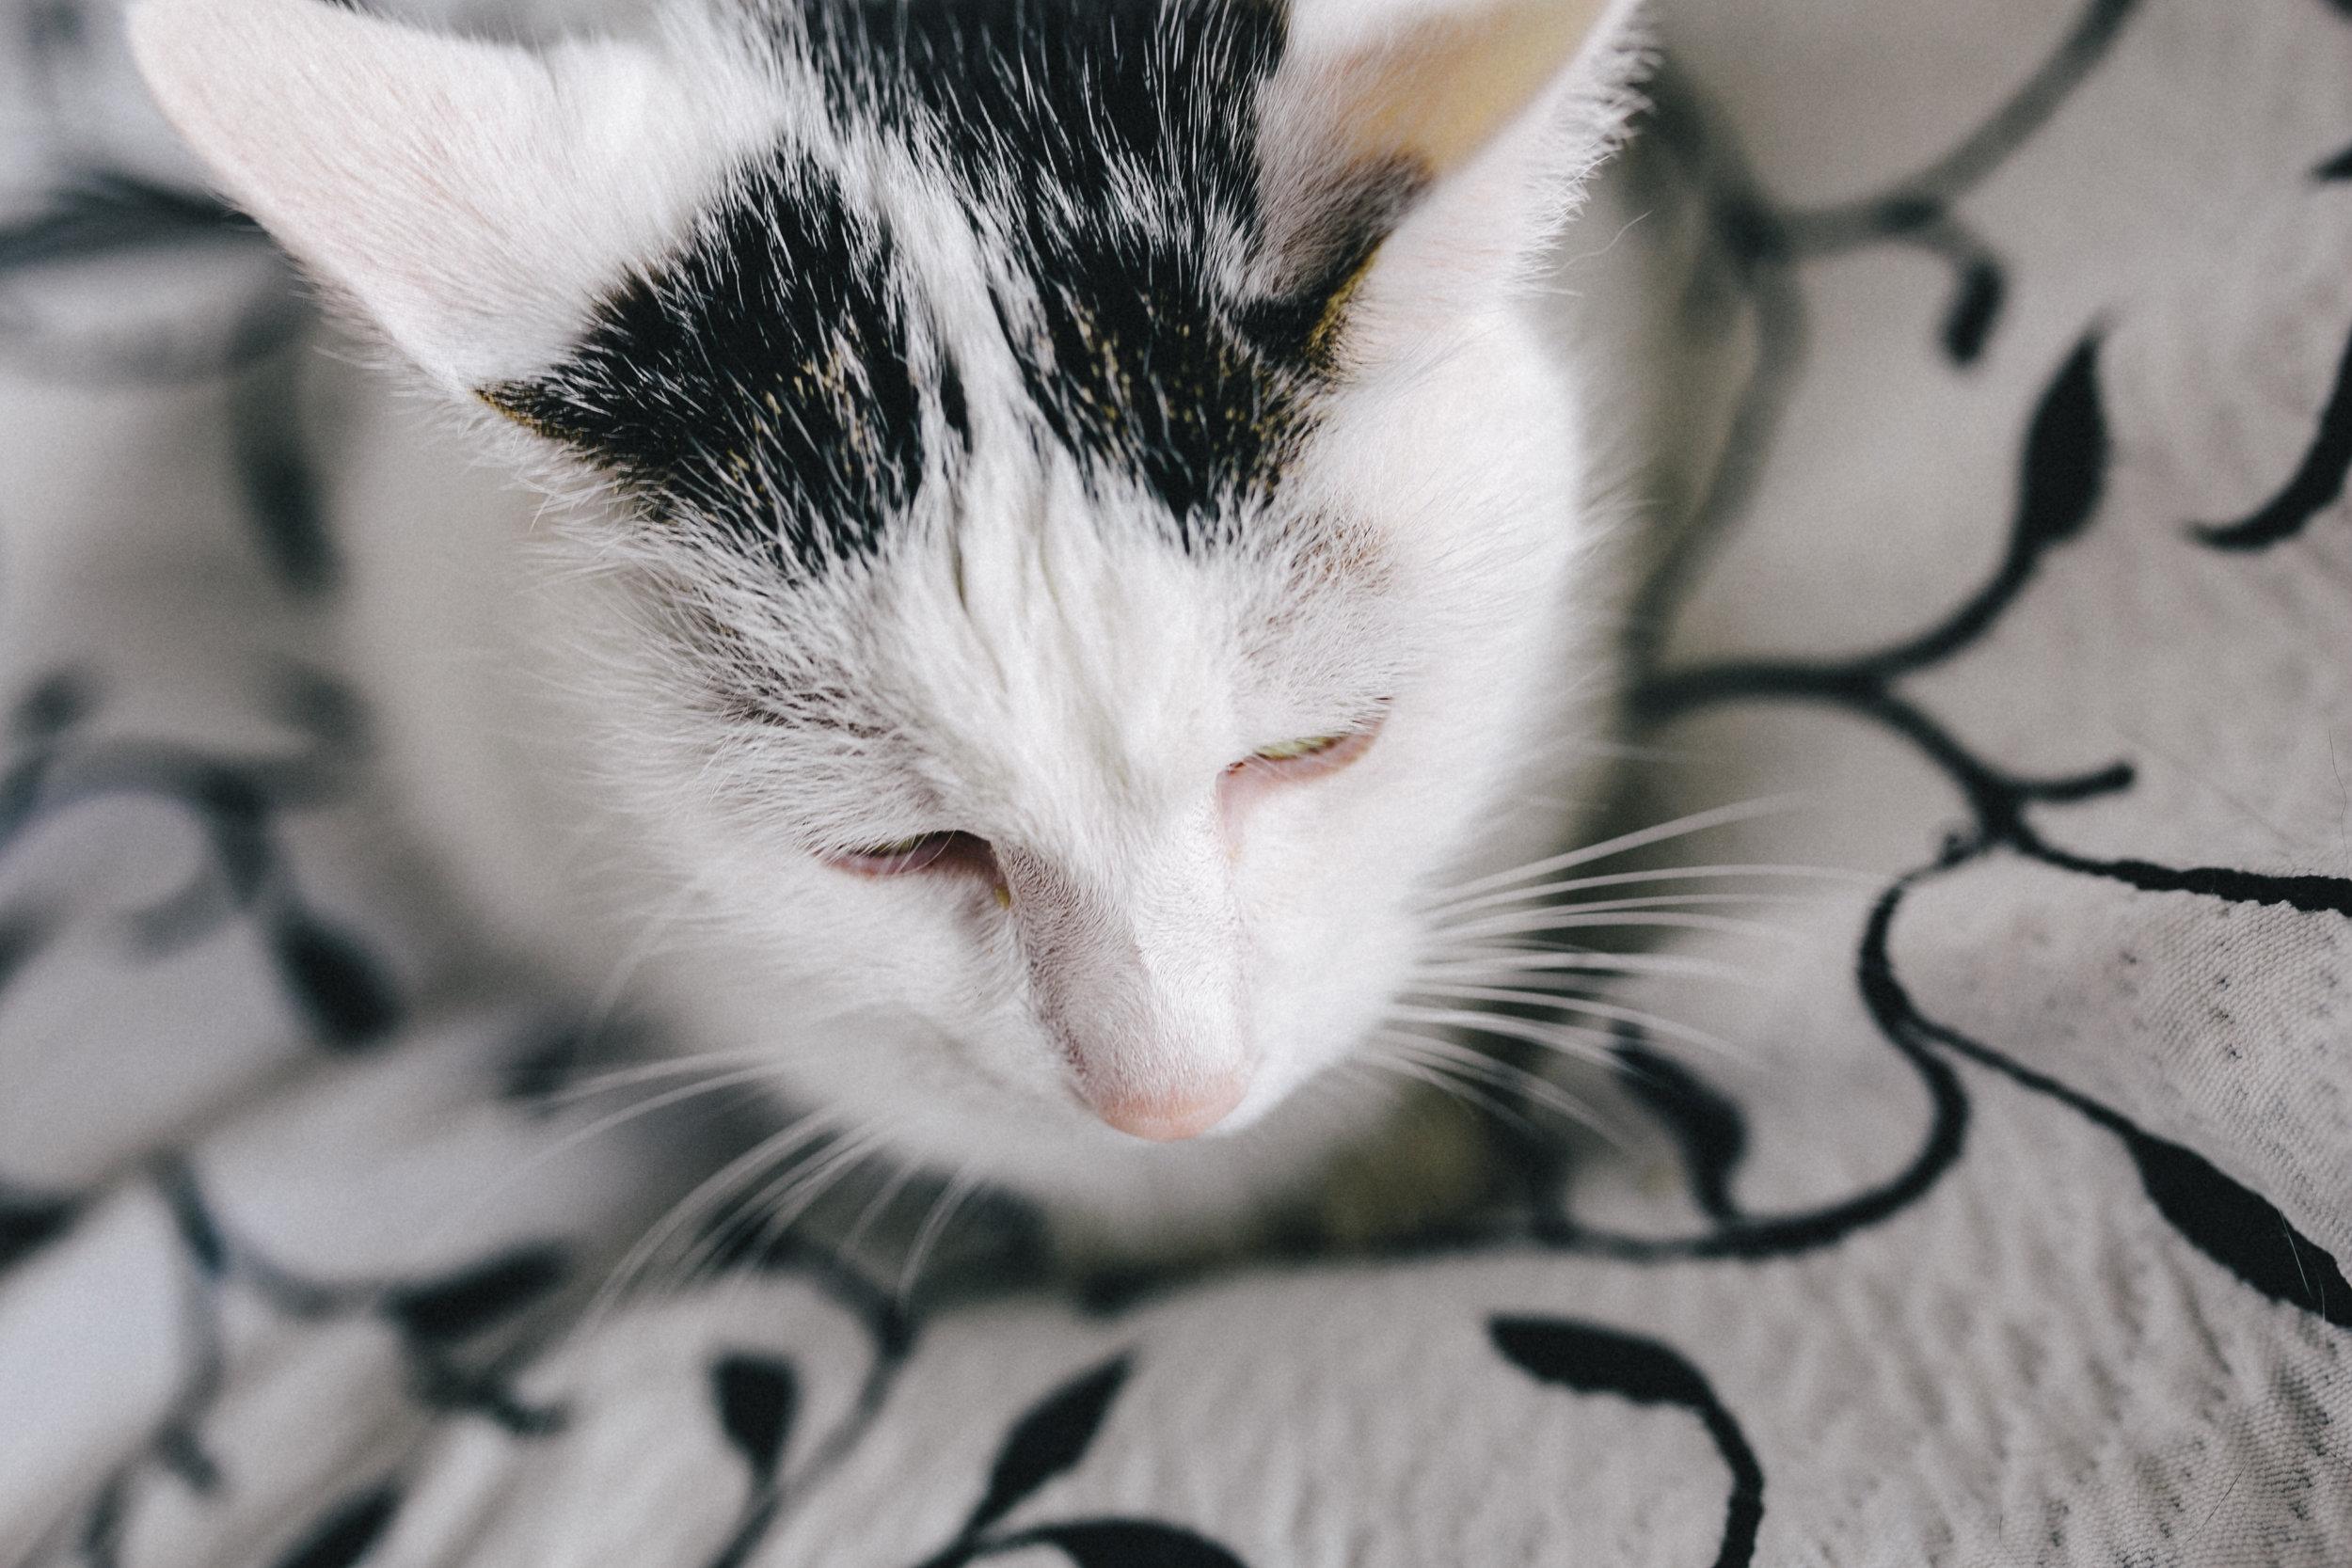 kaboompics_Portraits of white sad cat.jpg